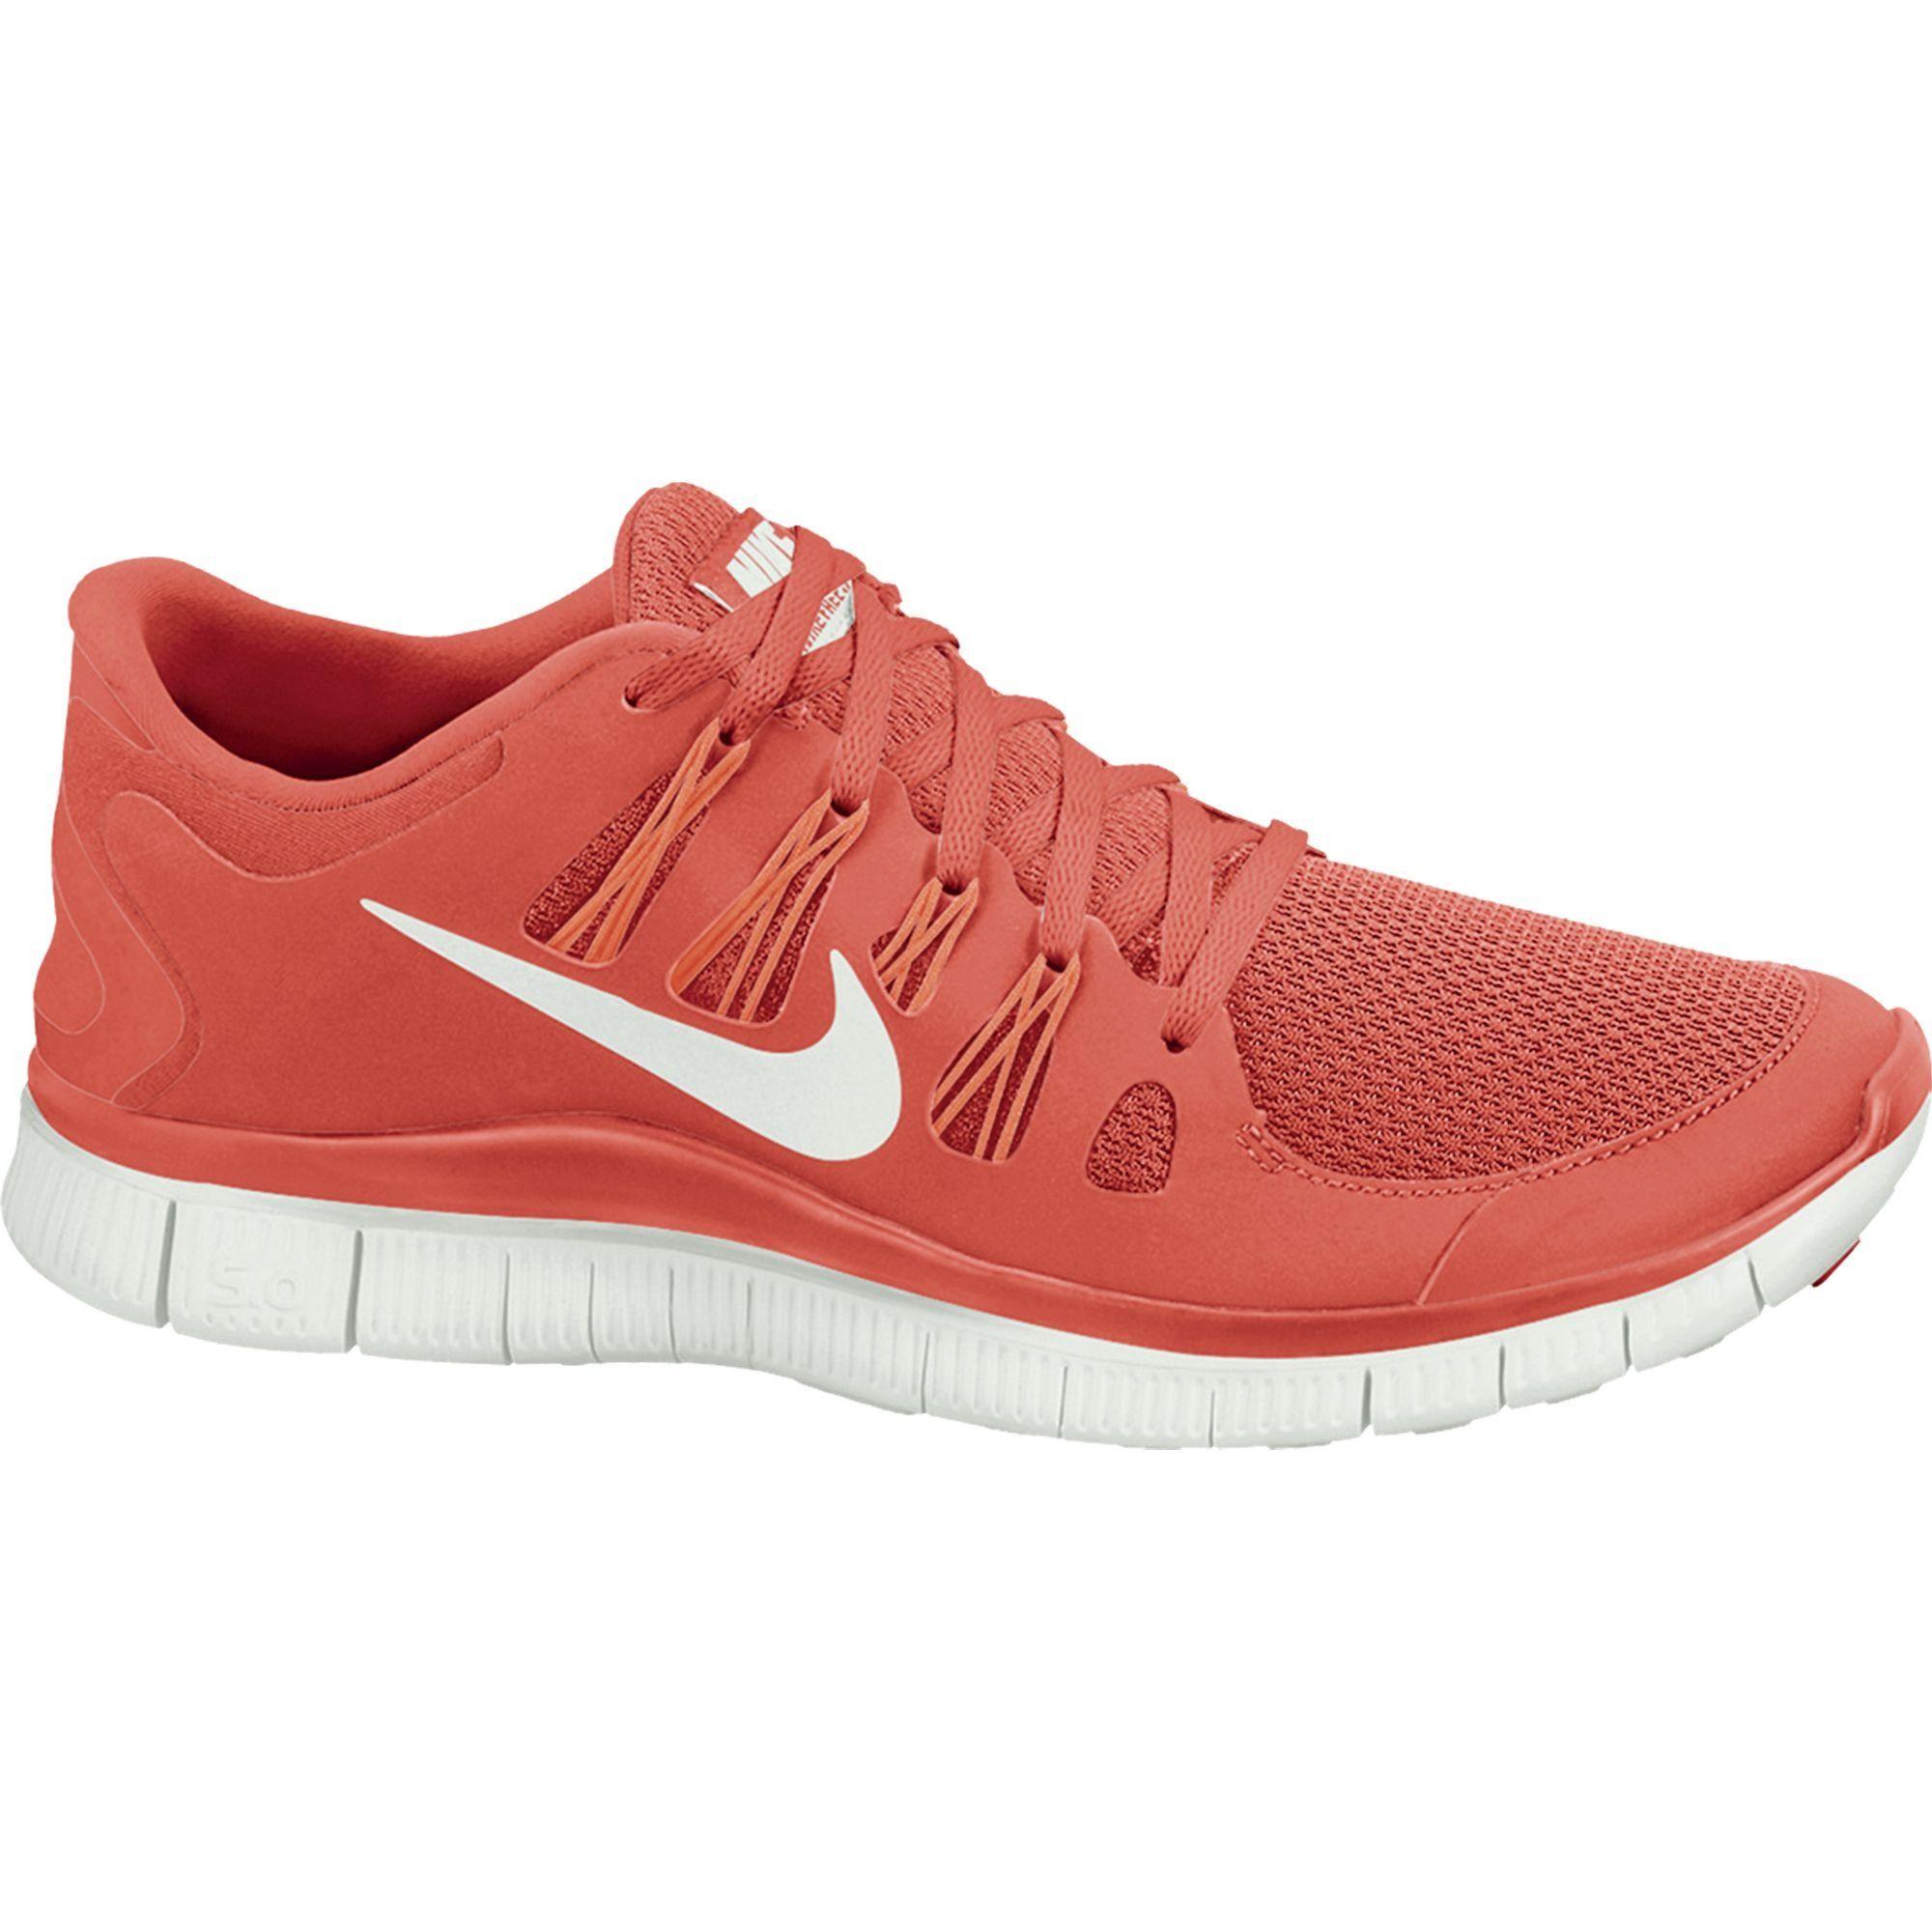 size 40 628de 4ed40 Amazon.com: NIKE FREE 5.0+ WOMENS RUNNING SHOES: Clothing ...